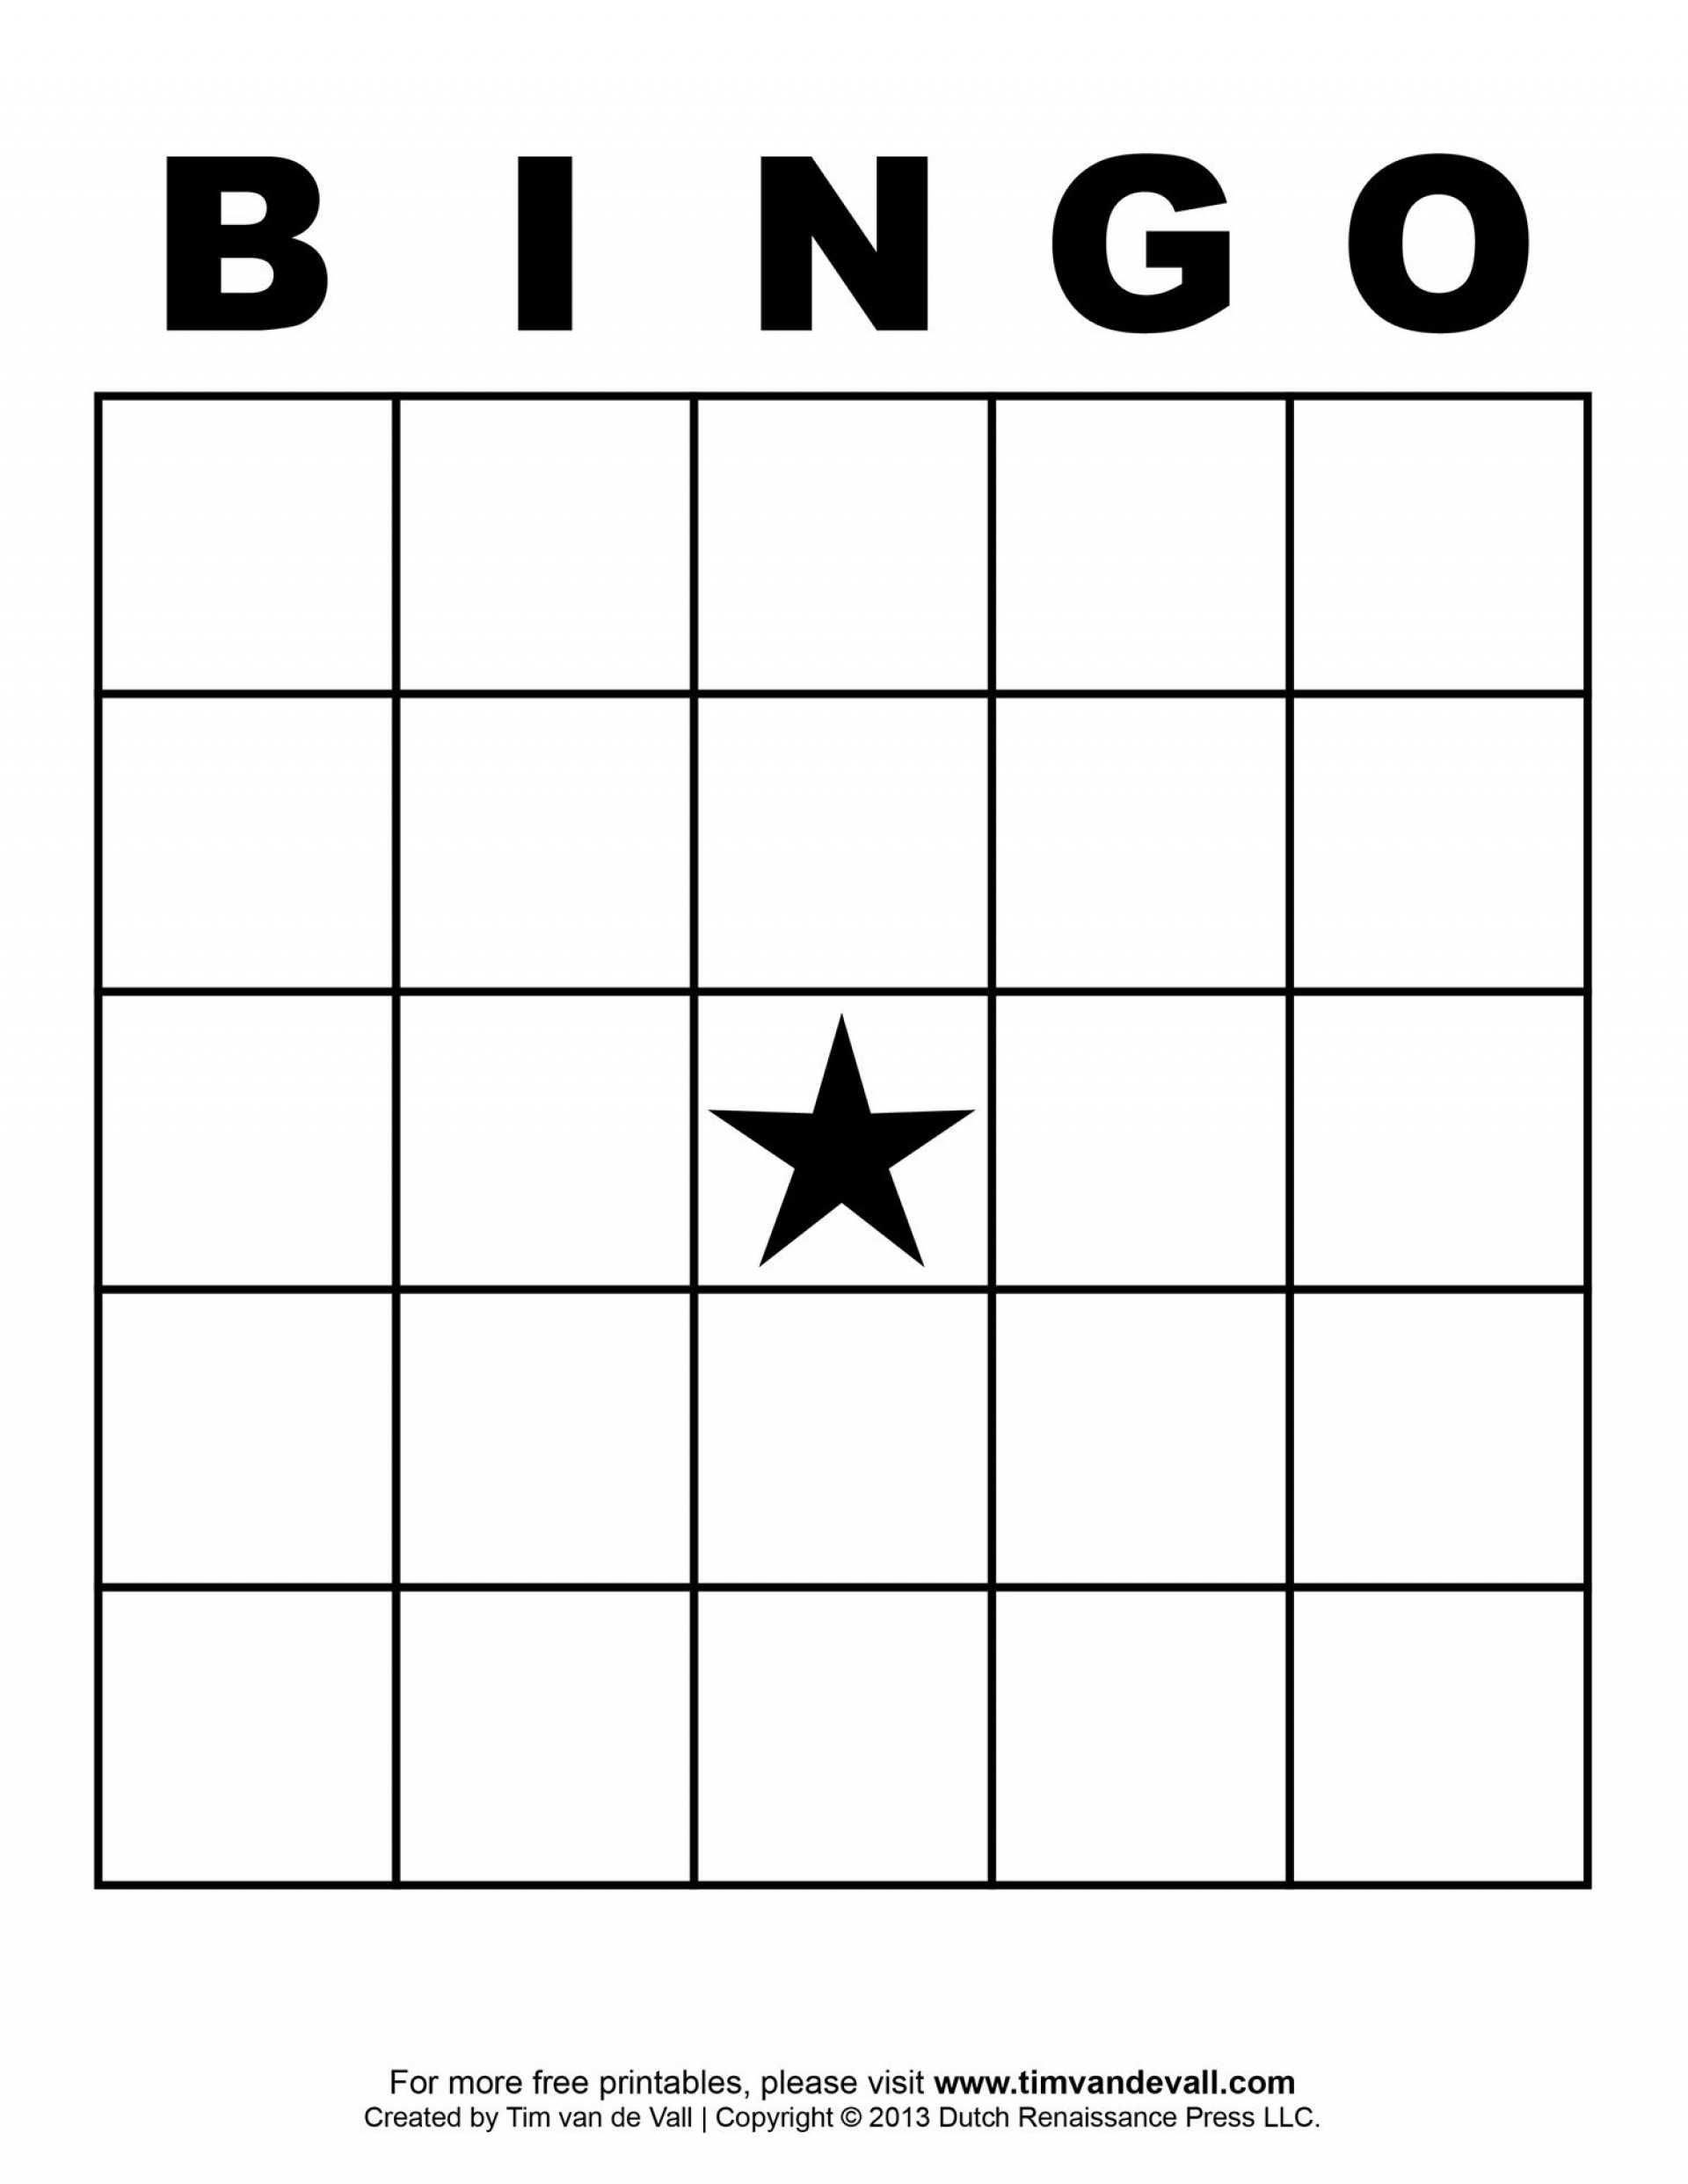 034 Template Ideas Blank Bingo Card Stirring 4X4 Excel Regarding Blank Bingo Card Template Microsoft Word